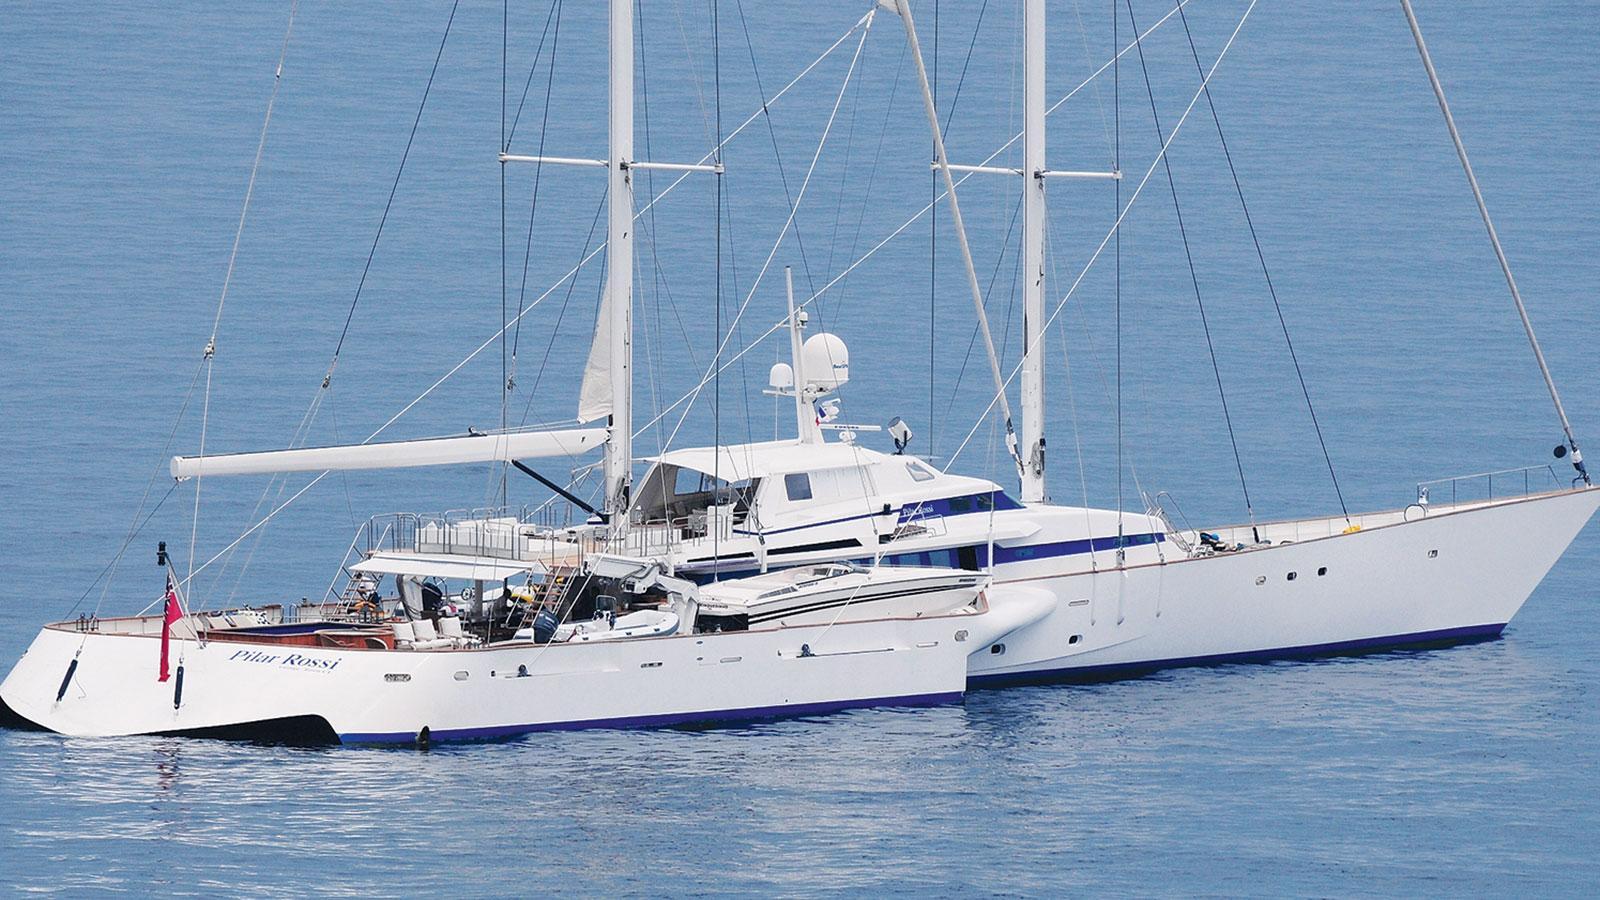 pilar-rossi-super-yacht-sailing-boat